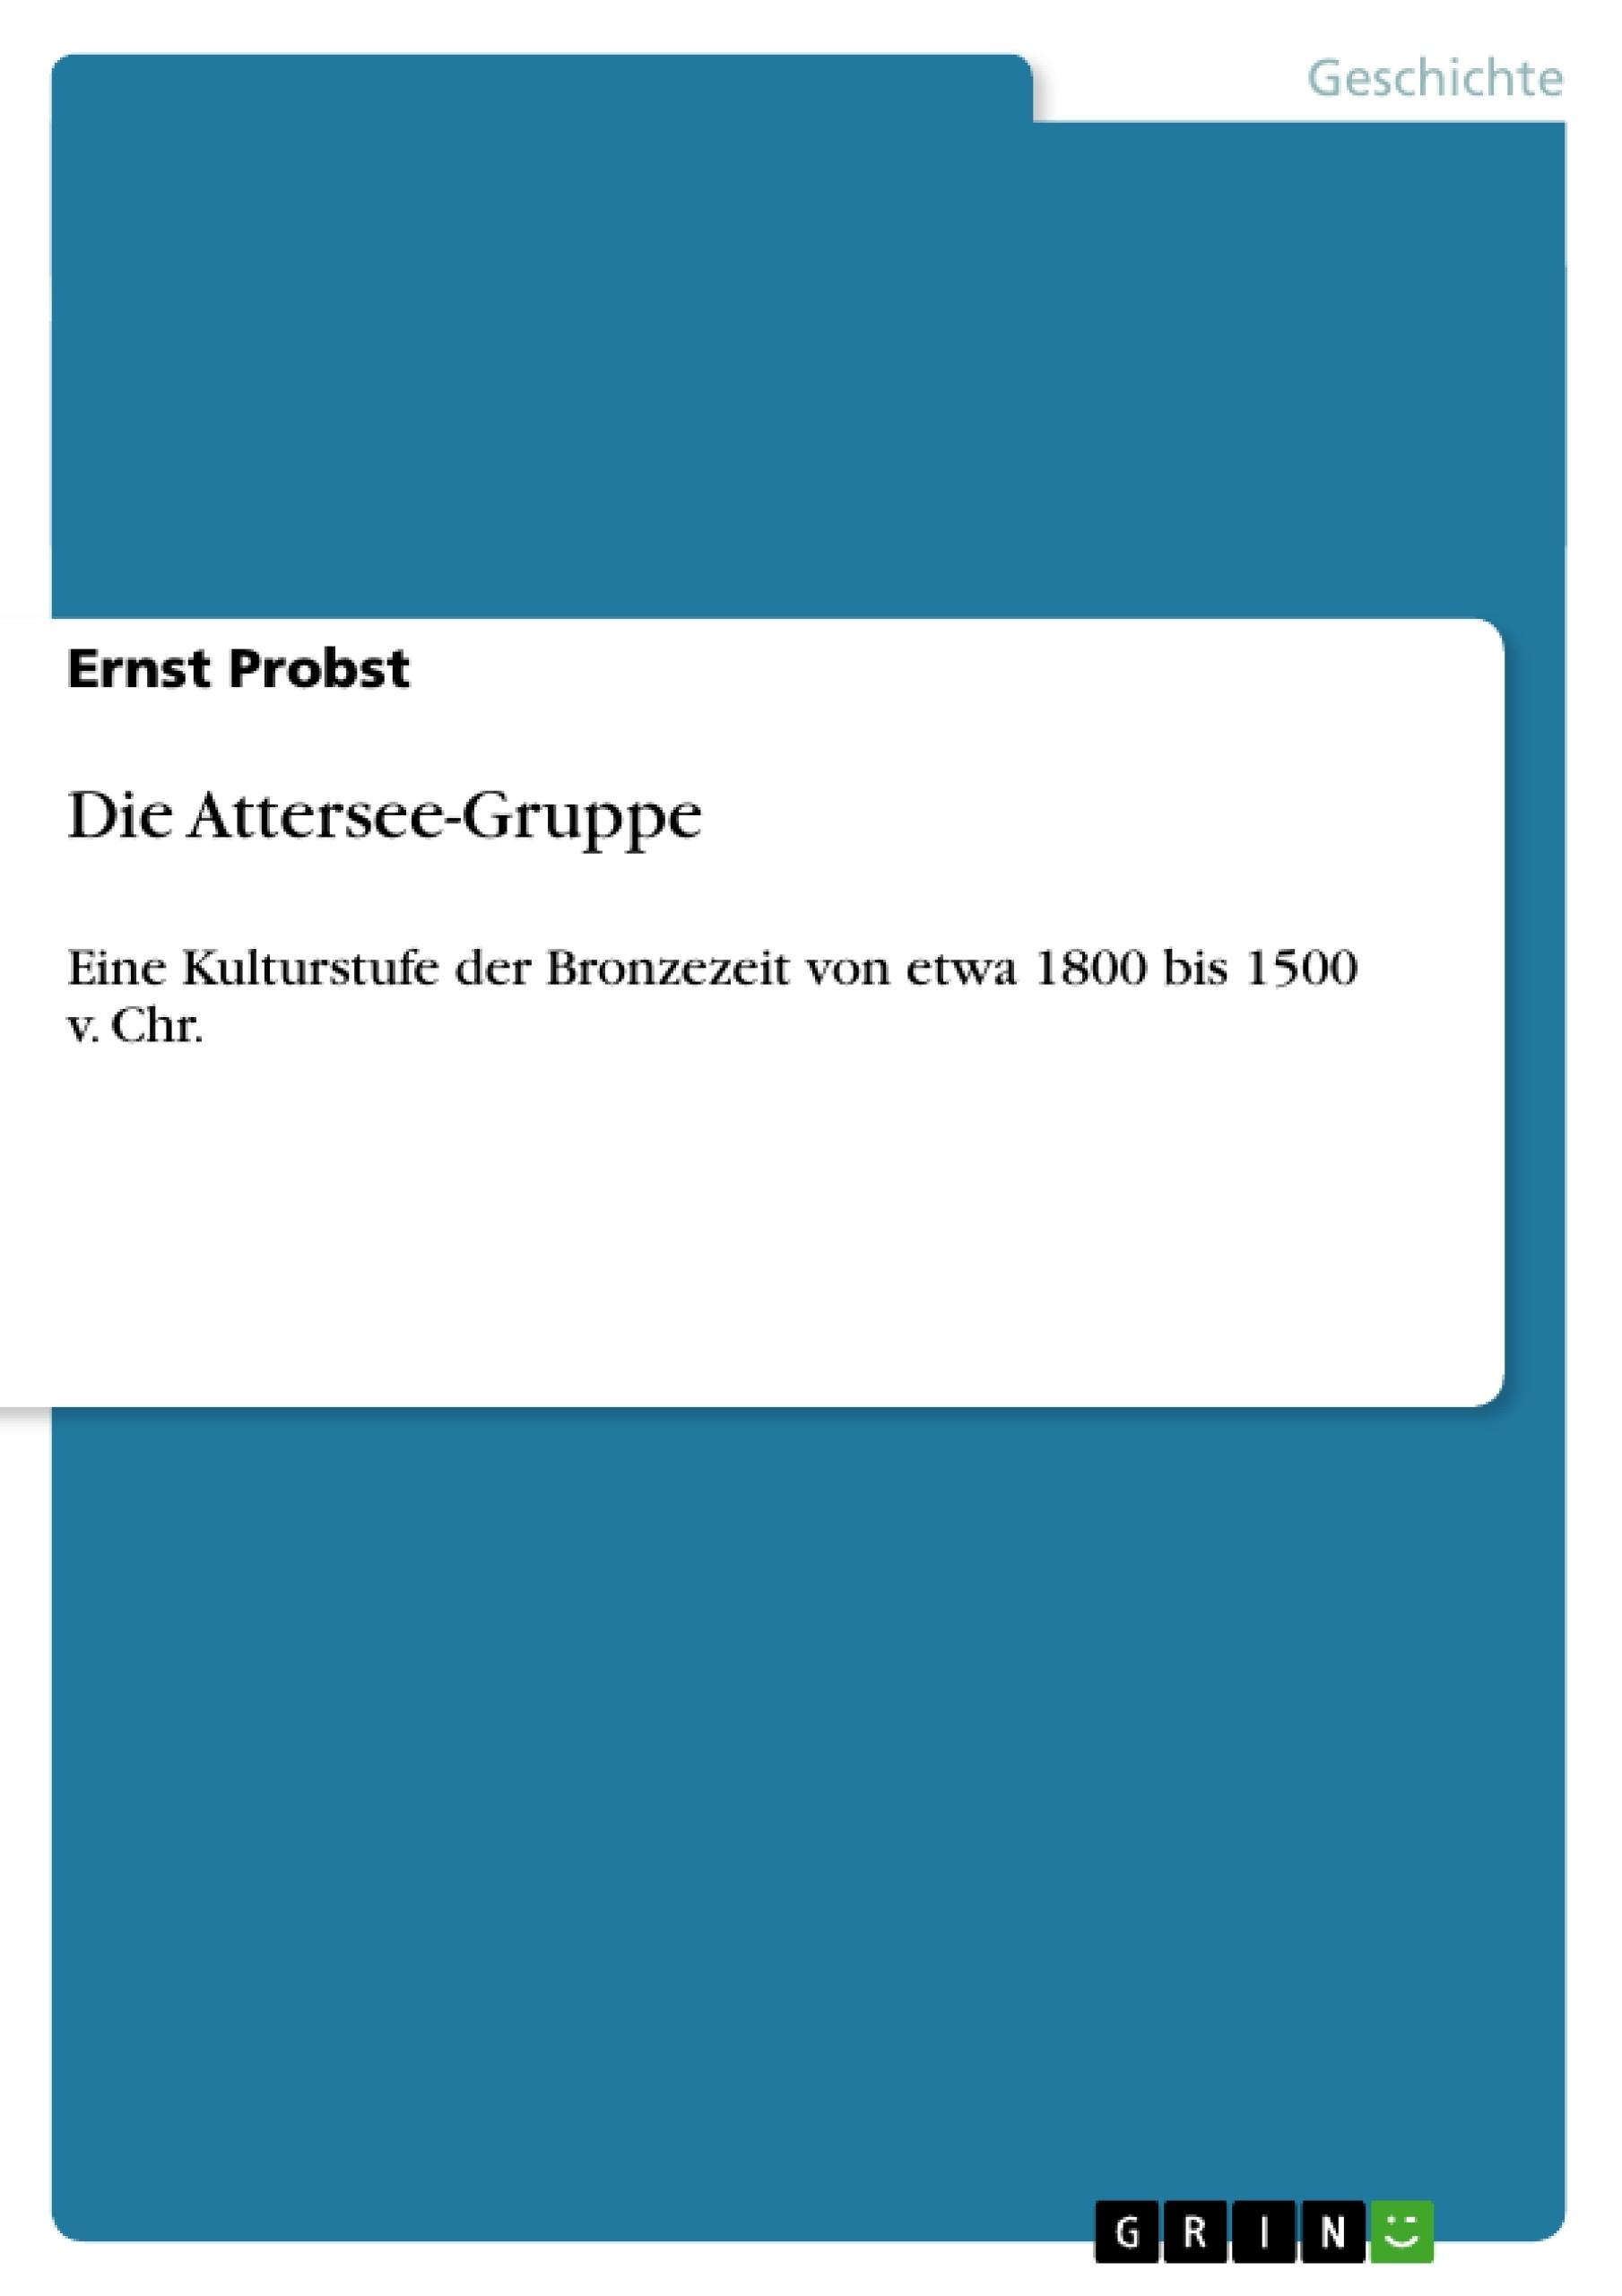 Titel: Die Attersee-Gruppe